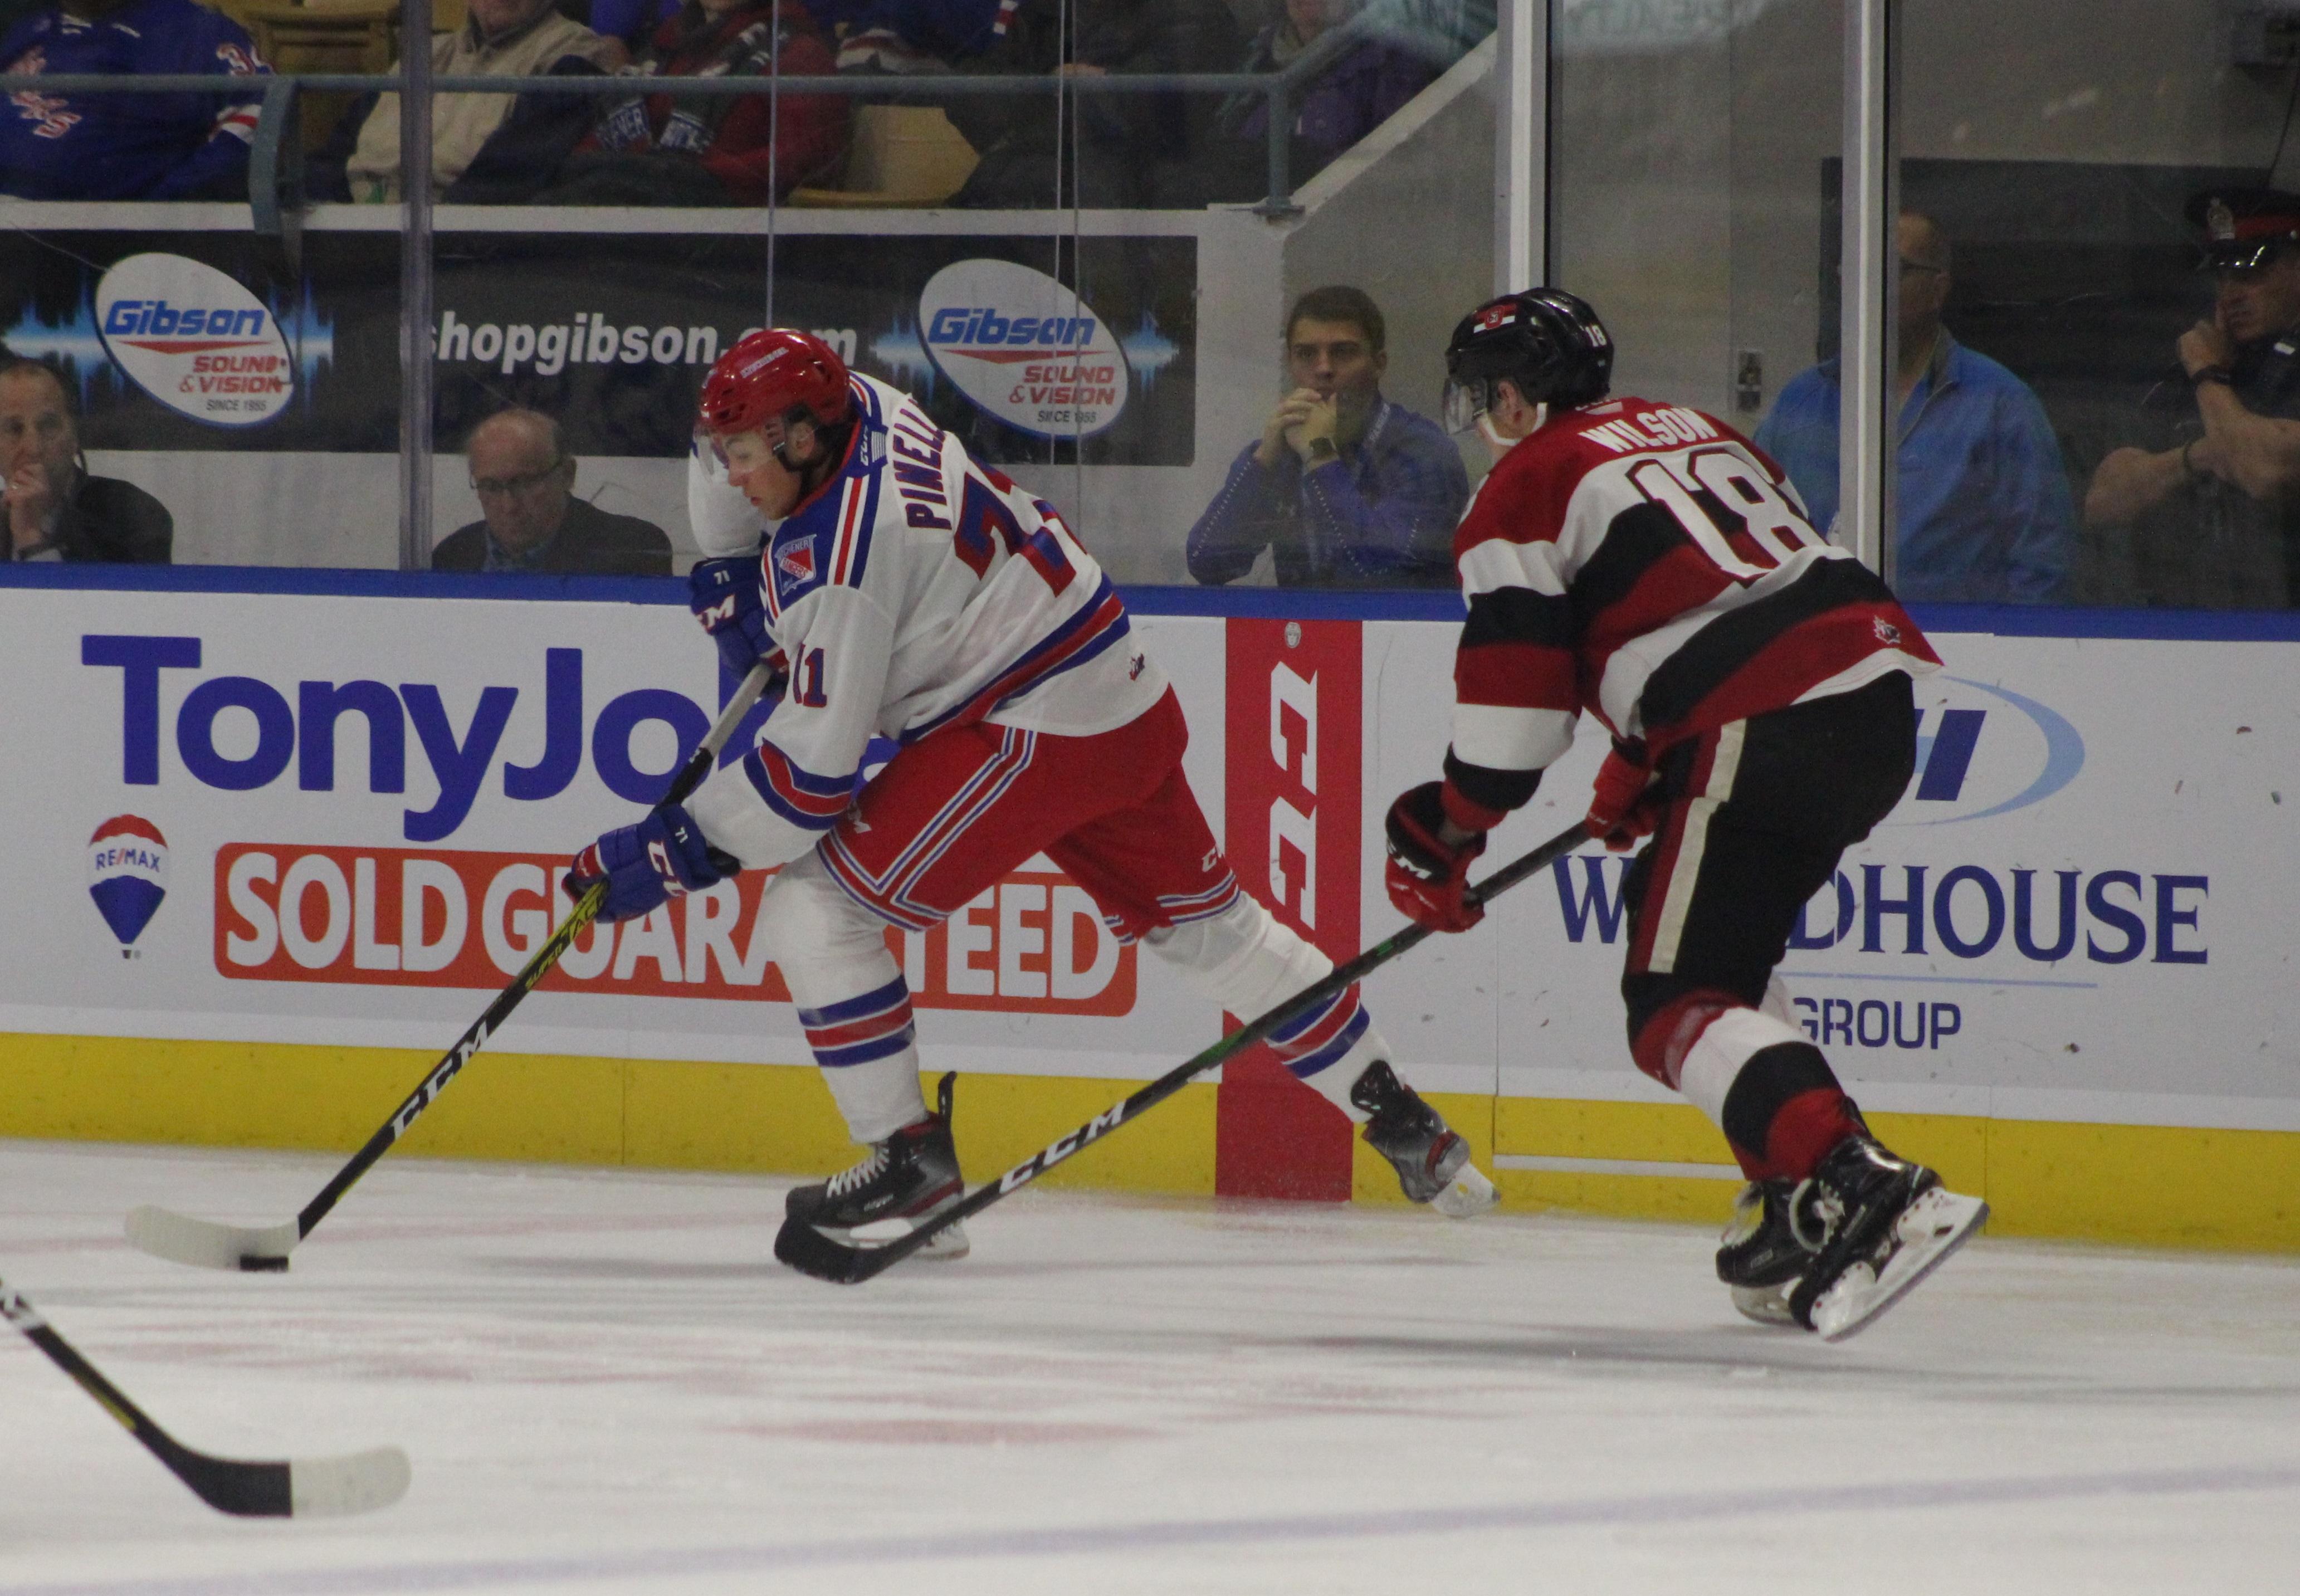 Rangers' Pinelli to represent Canada at World Under-17 Hockey Challenge